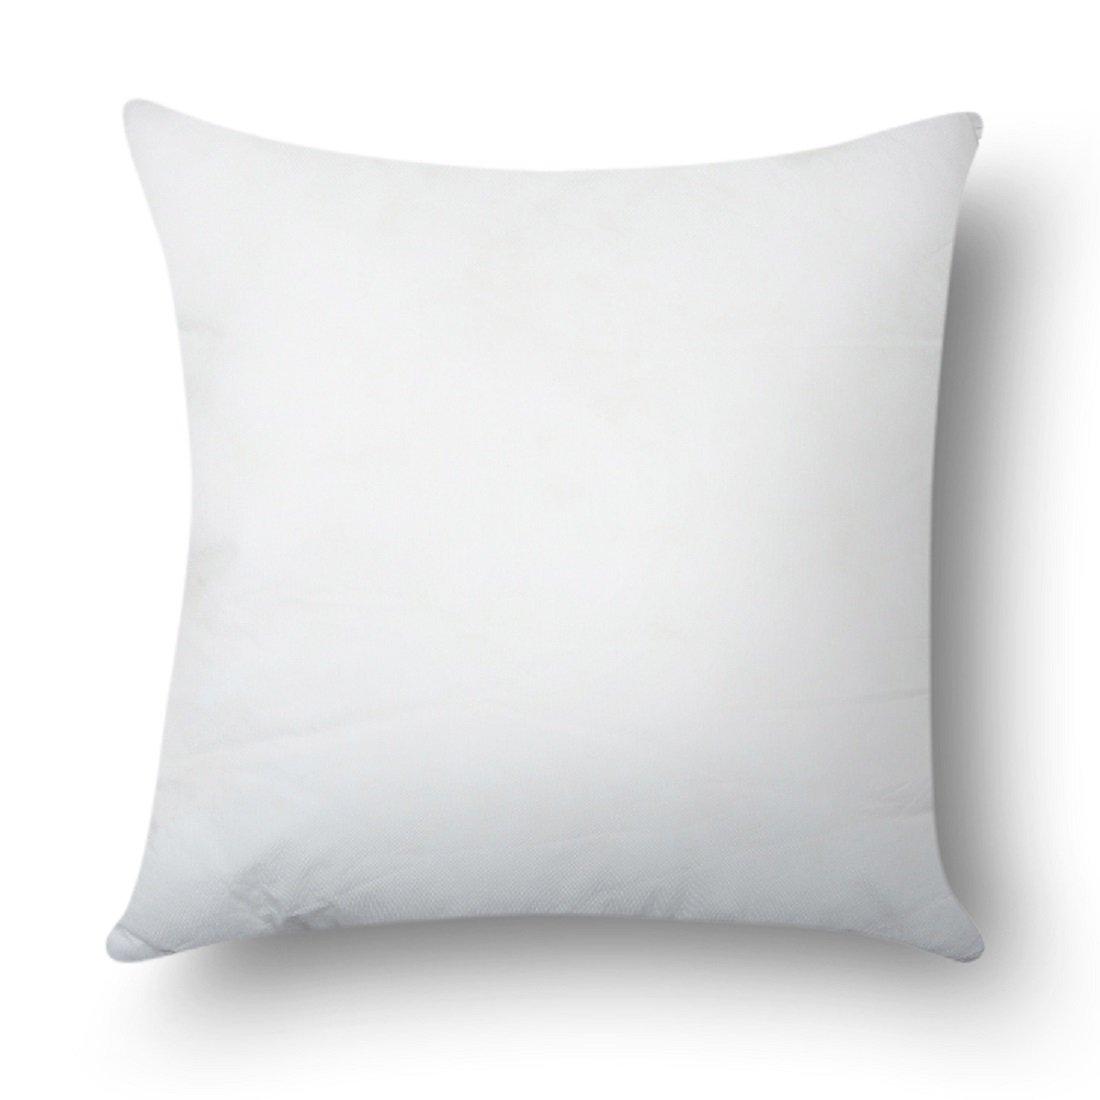 20X20 Inches Cushion Filler